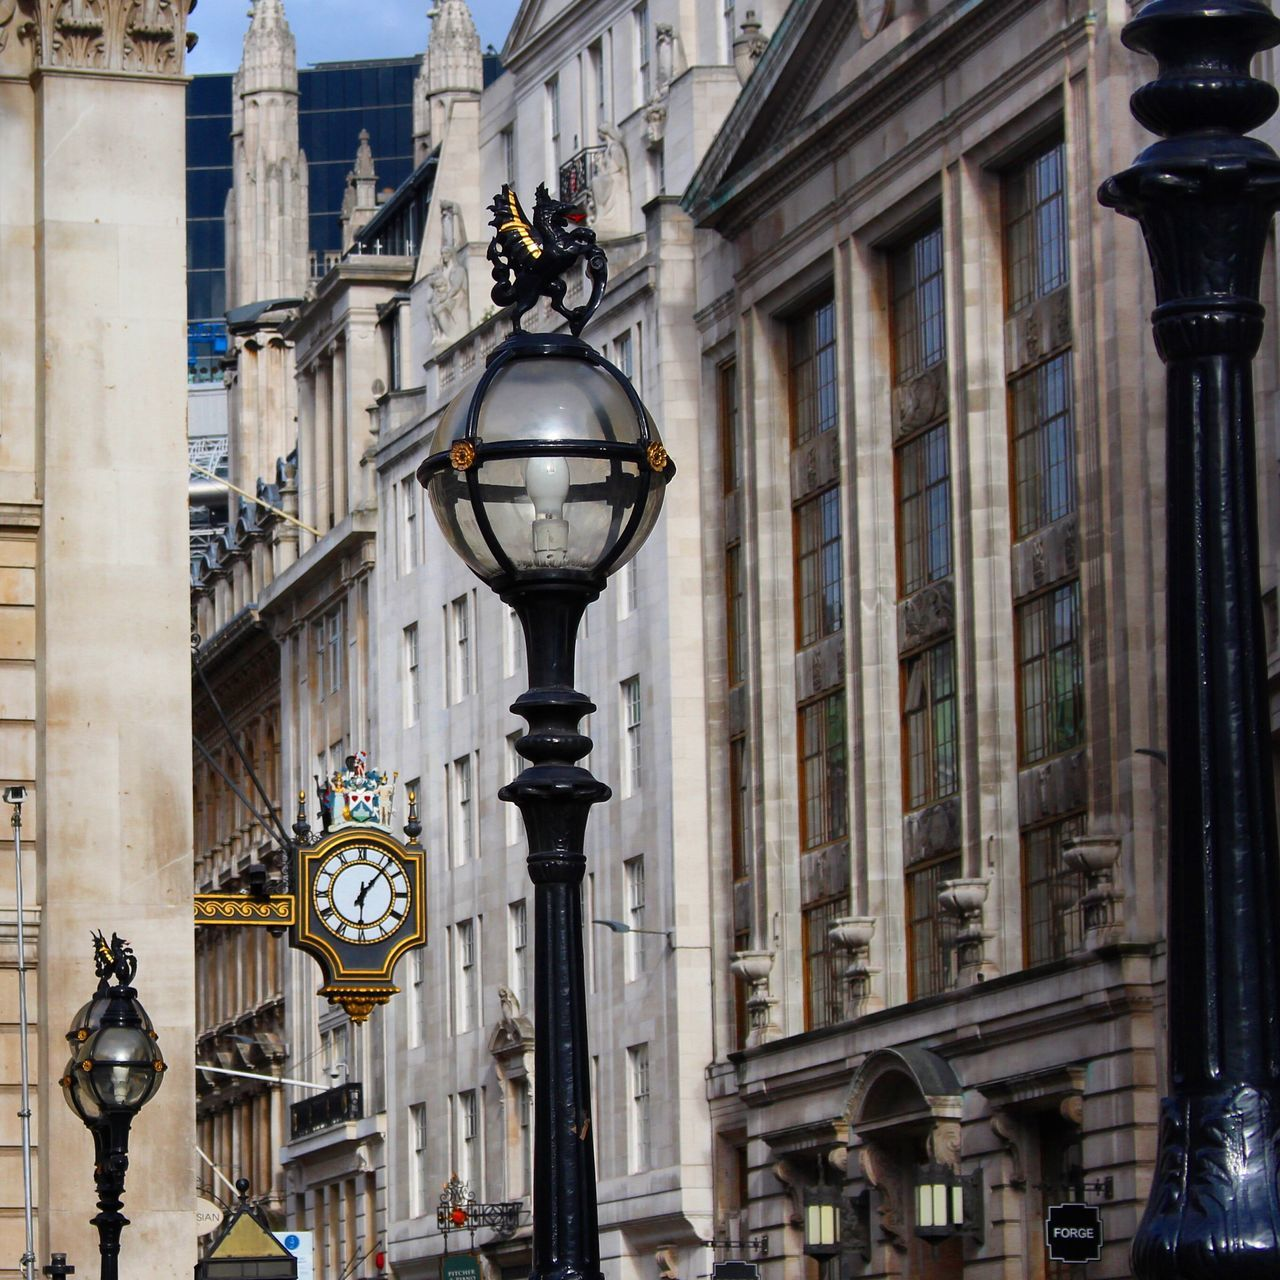 London Lifestyle Building Exterior London Bank